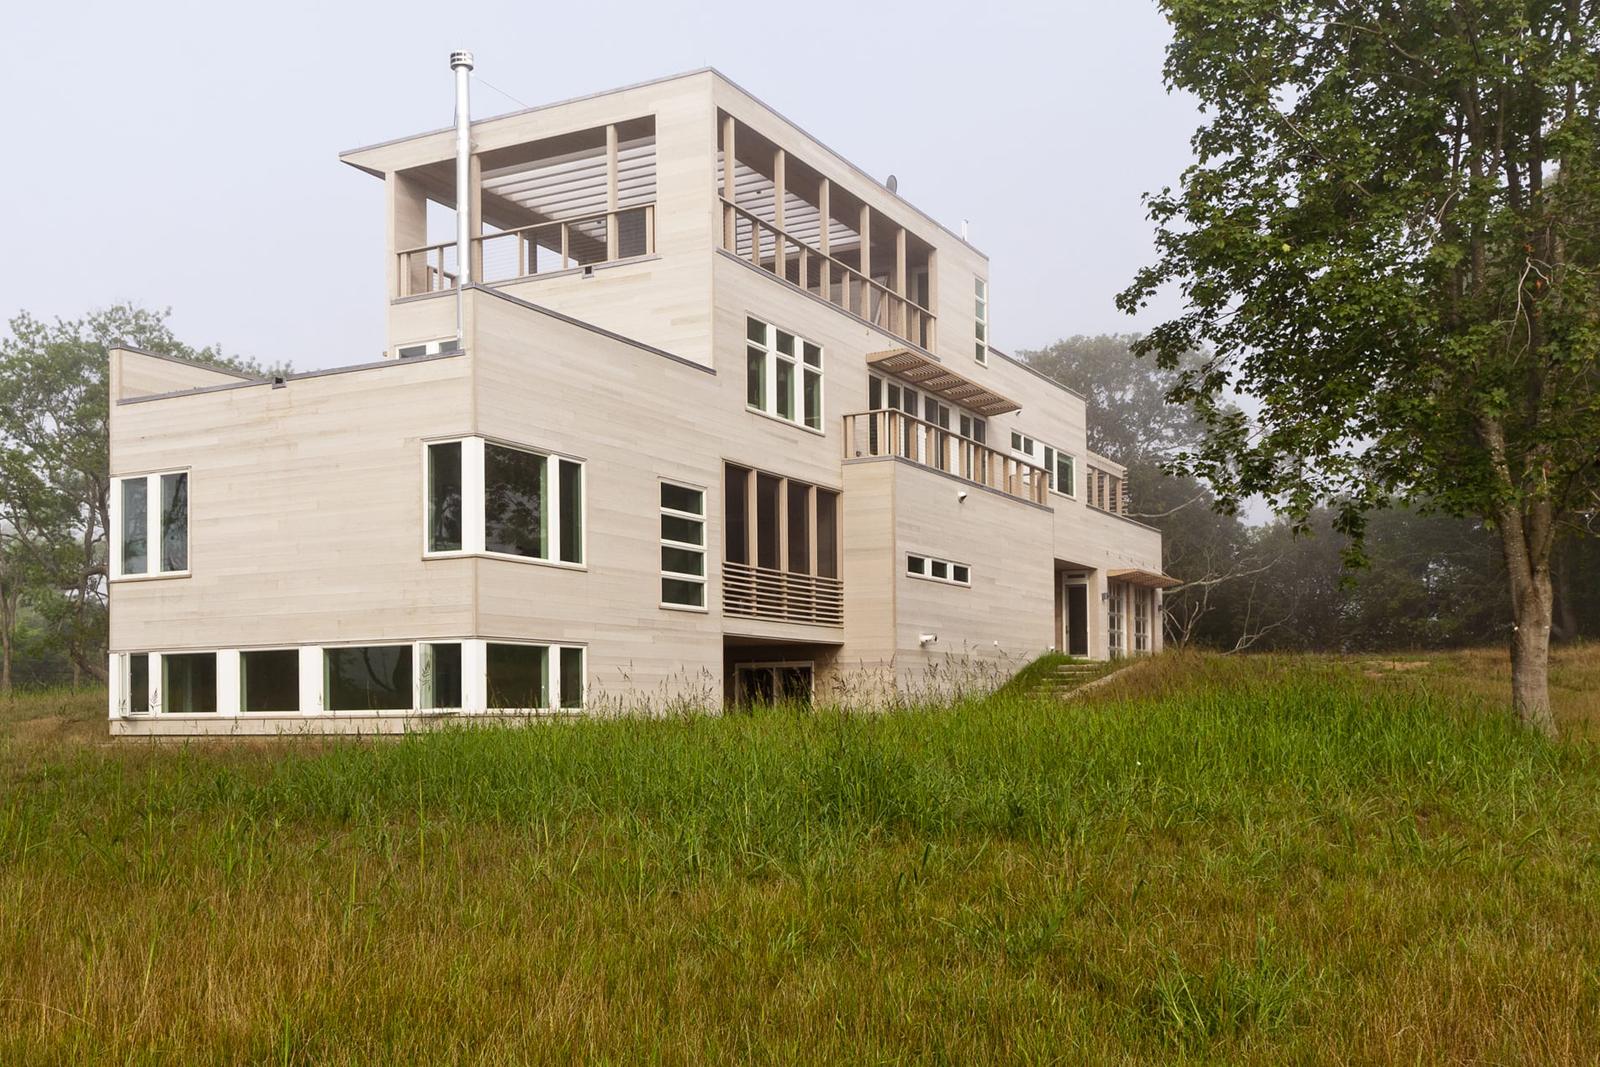 04-res4-resolution-4-architecture-modern-modular-home-prefab-house-fishers-island-exterior.jpg